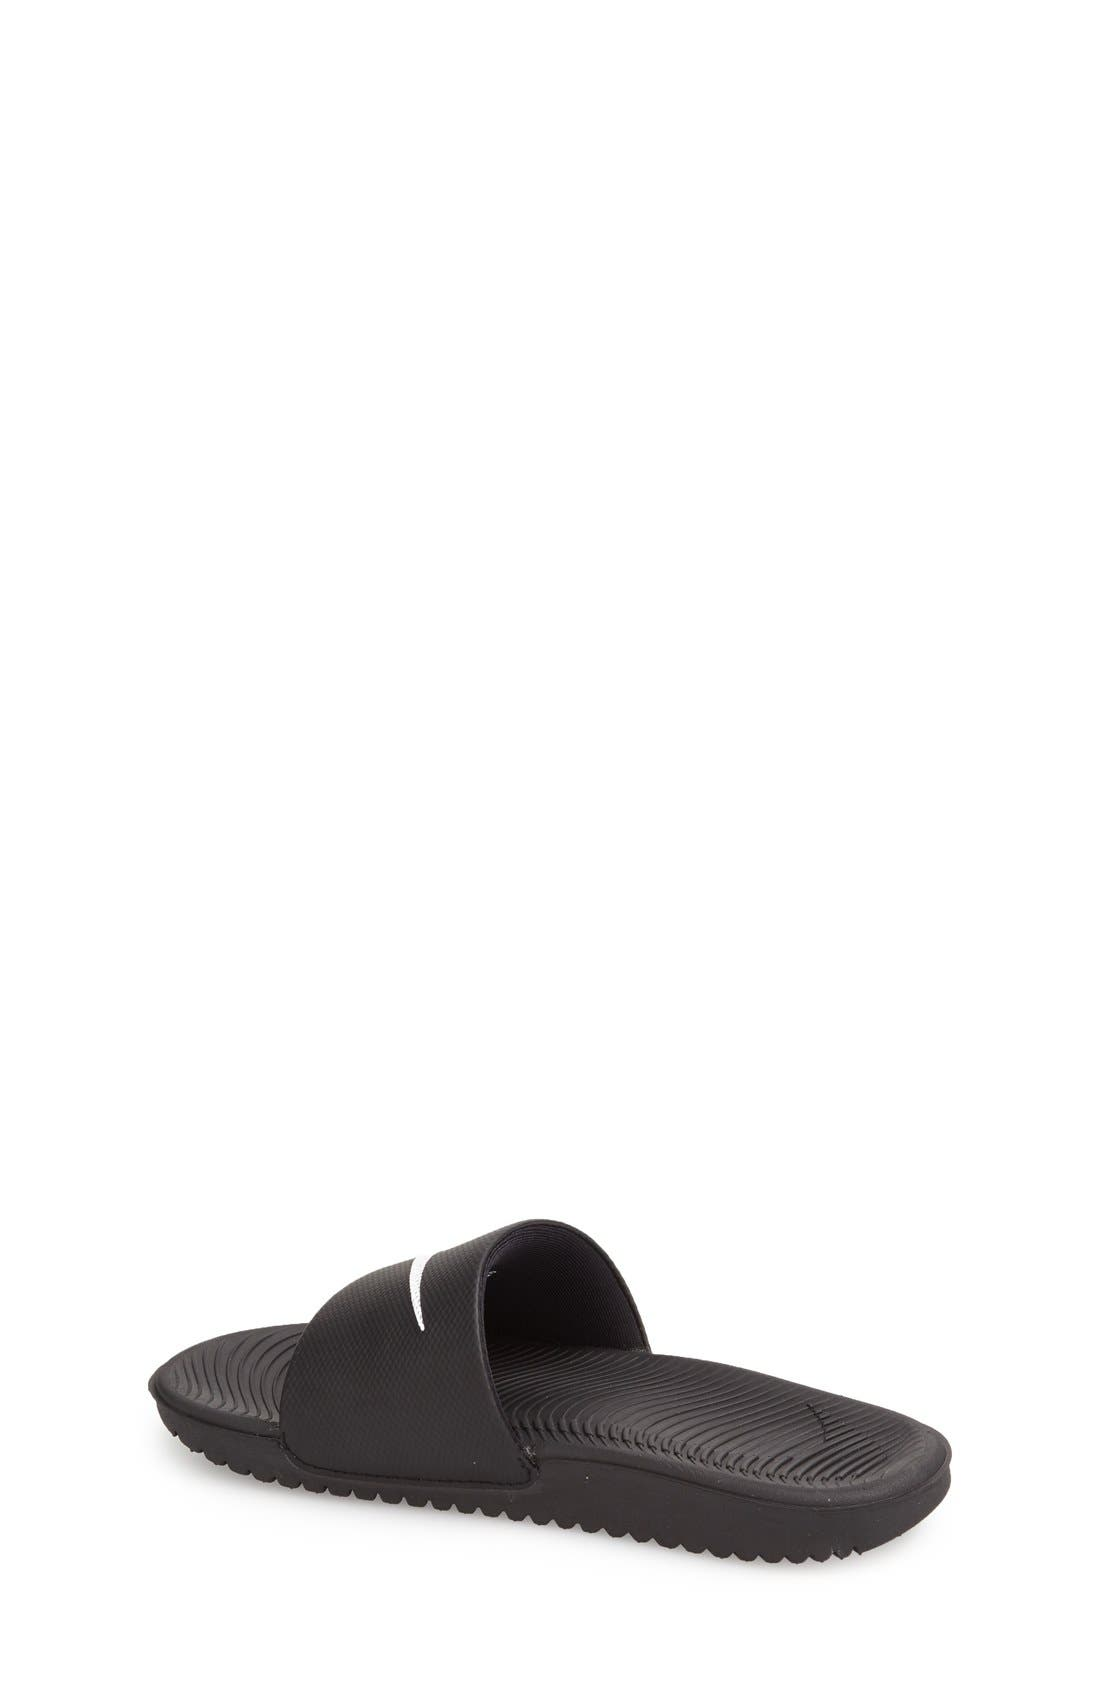 'Kawa' Slide Sandal,                             Alternate thumbnail 3, color,                             BLACK/ WHITE